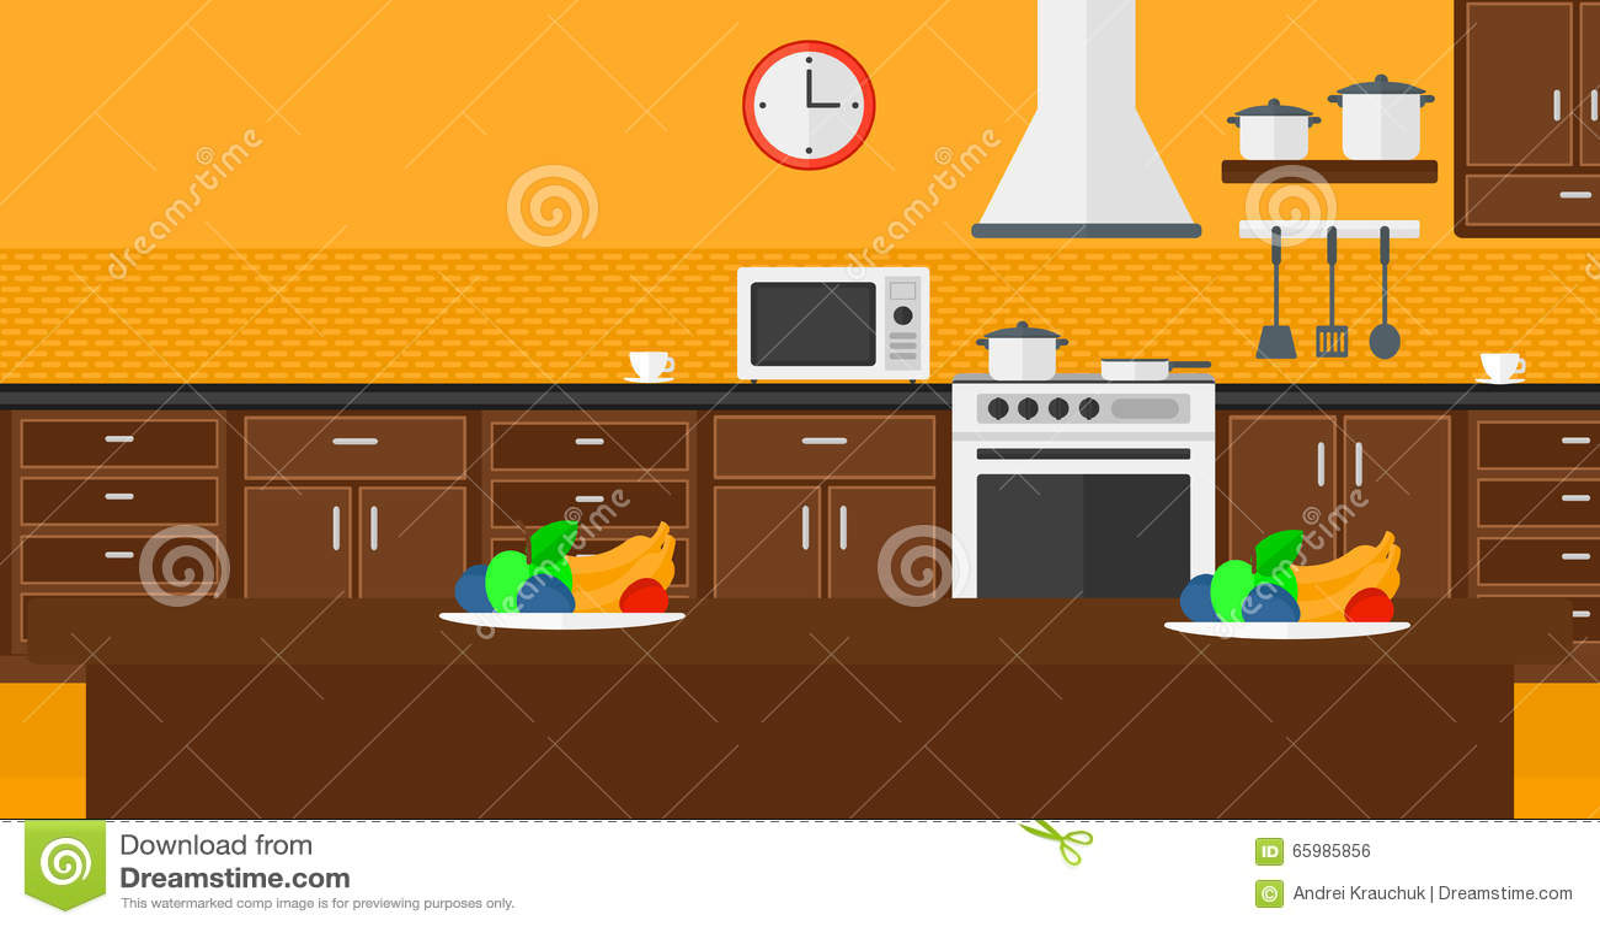 Uncategorized Kitchen With Appliances background of kitchen with appliances stock vector image 65985856 vector